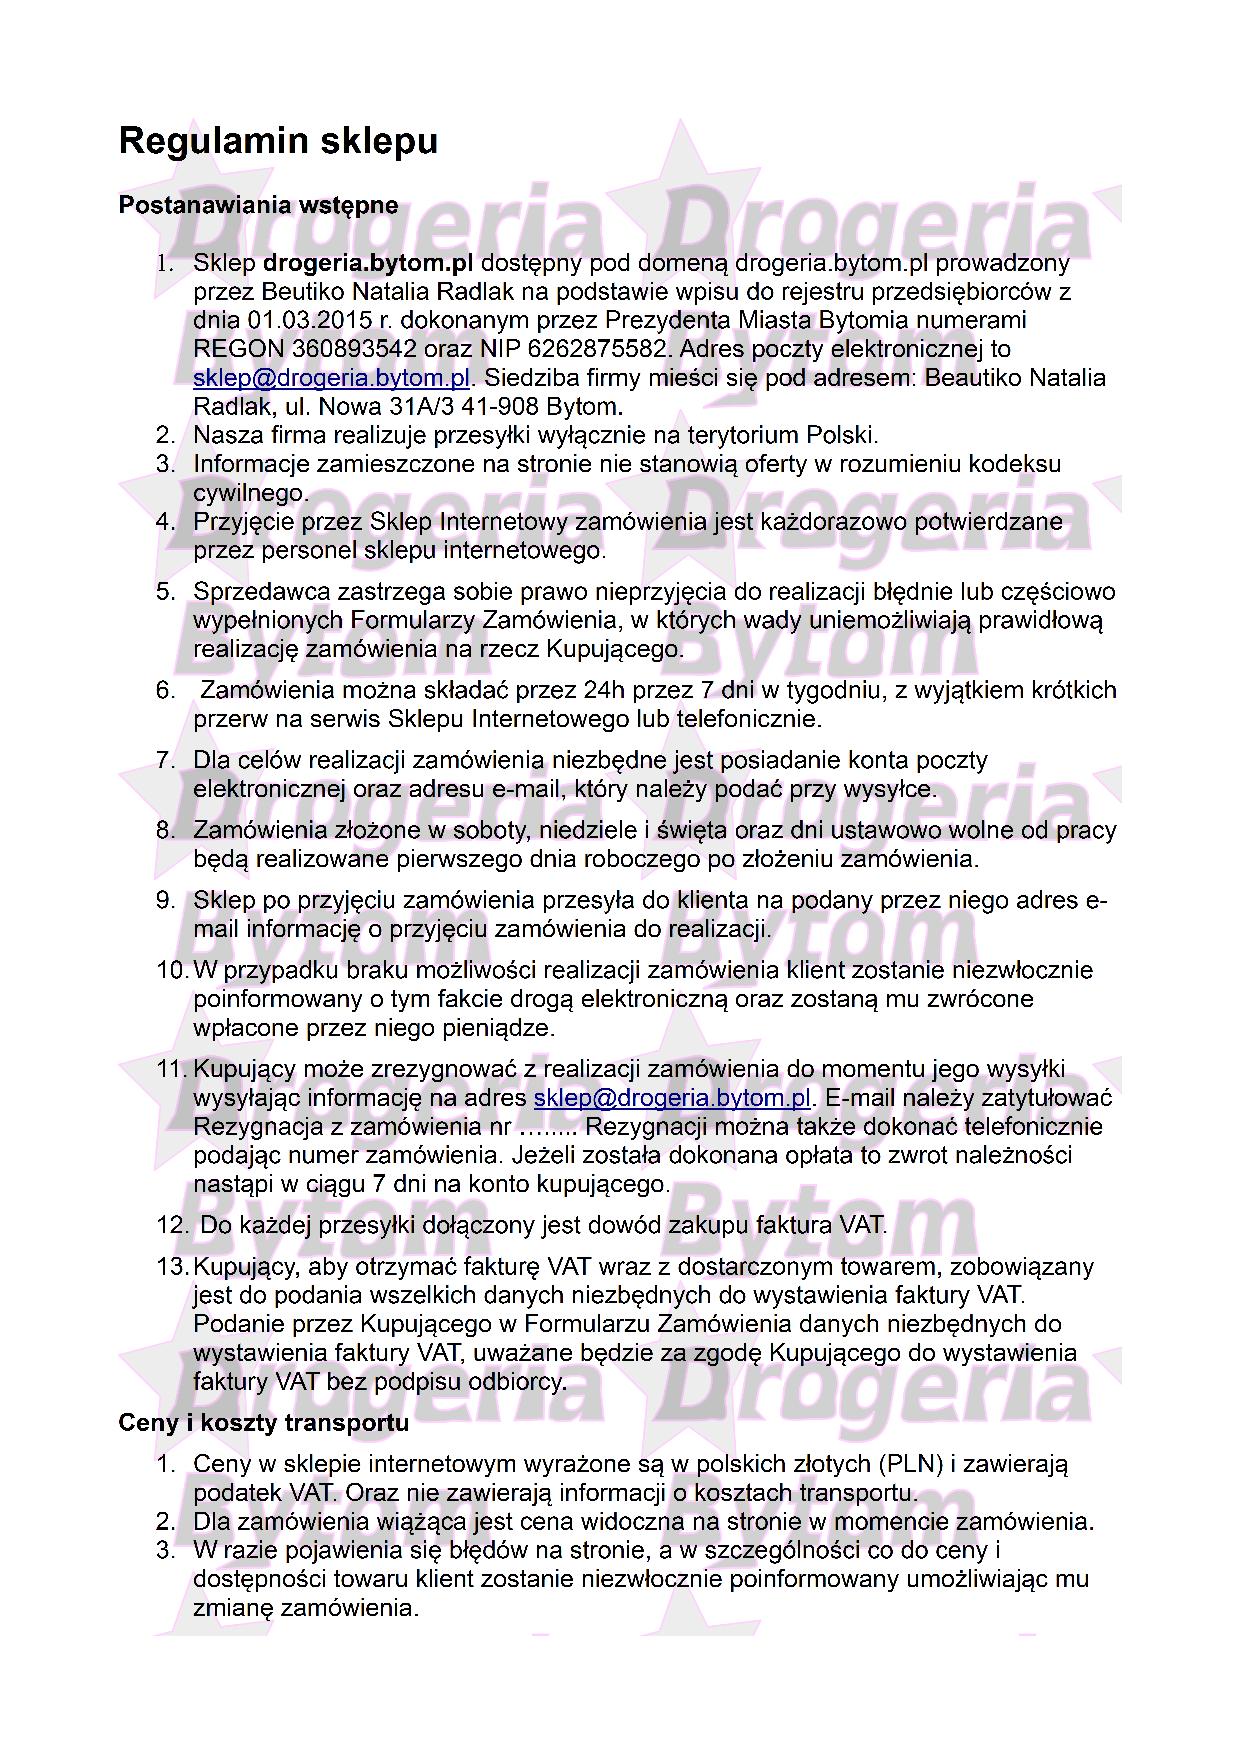 Regulamin część nr 1